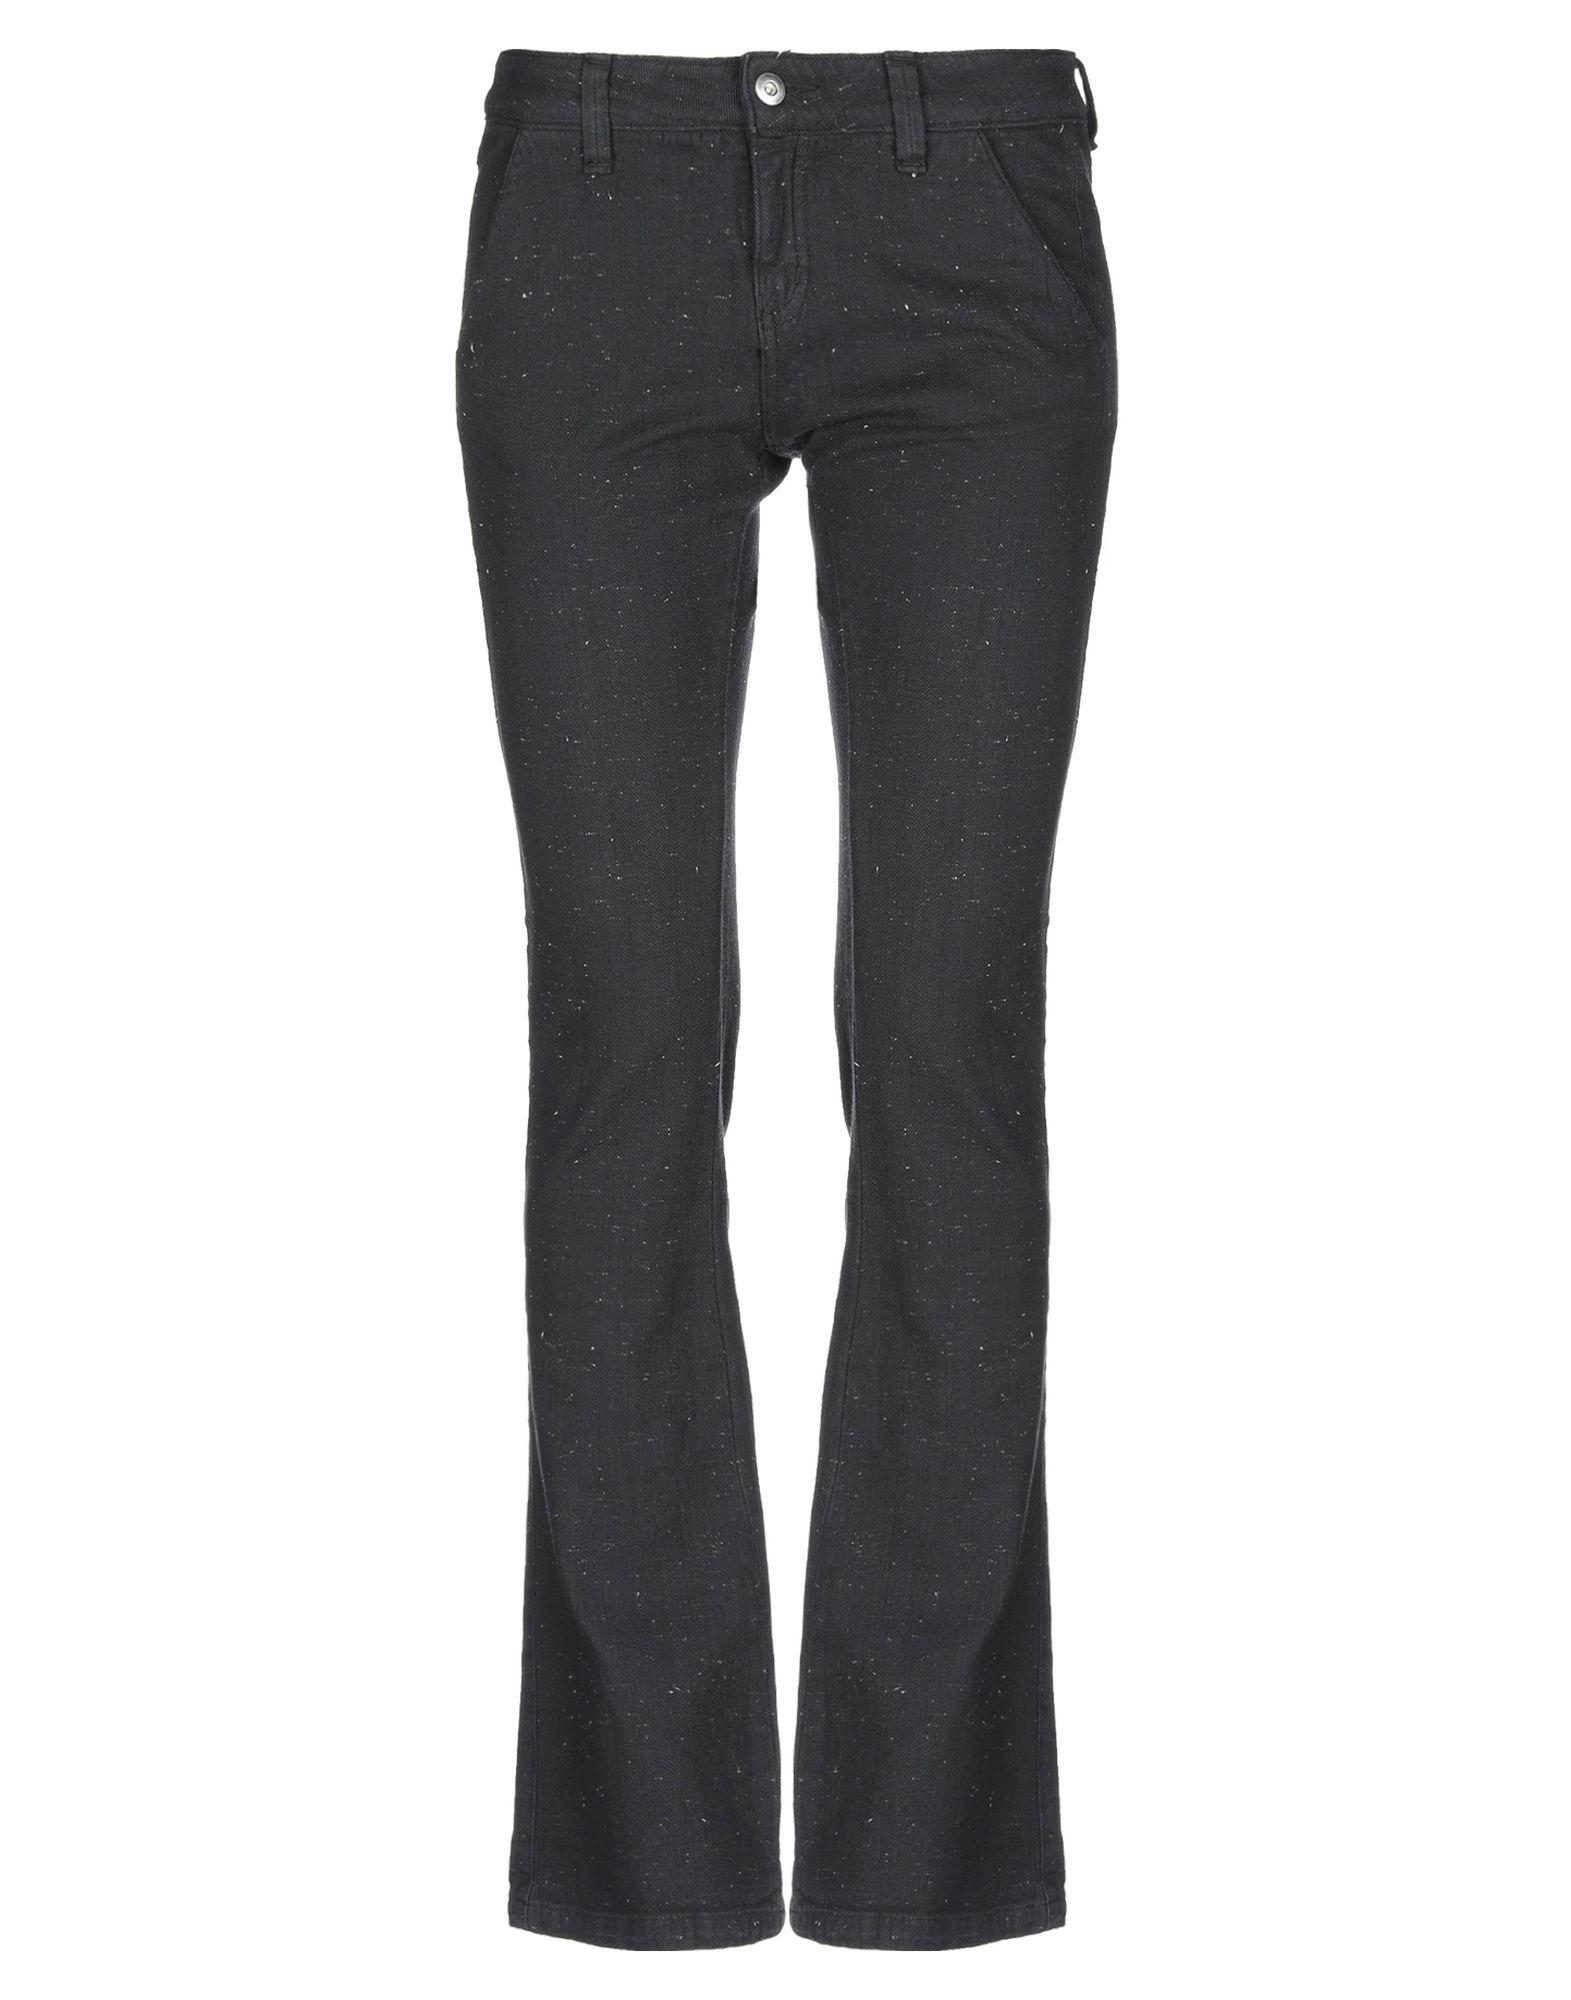 TROU AUX BICHES Джинсовые брюки trou aux biches юбка до колена